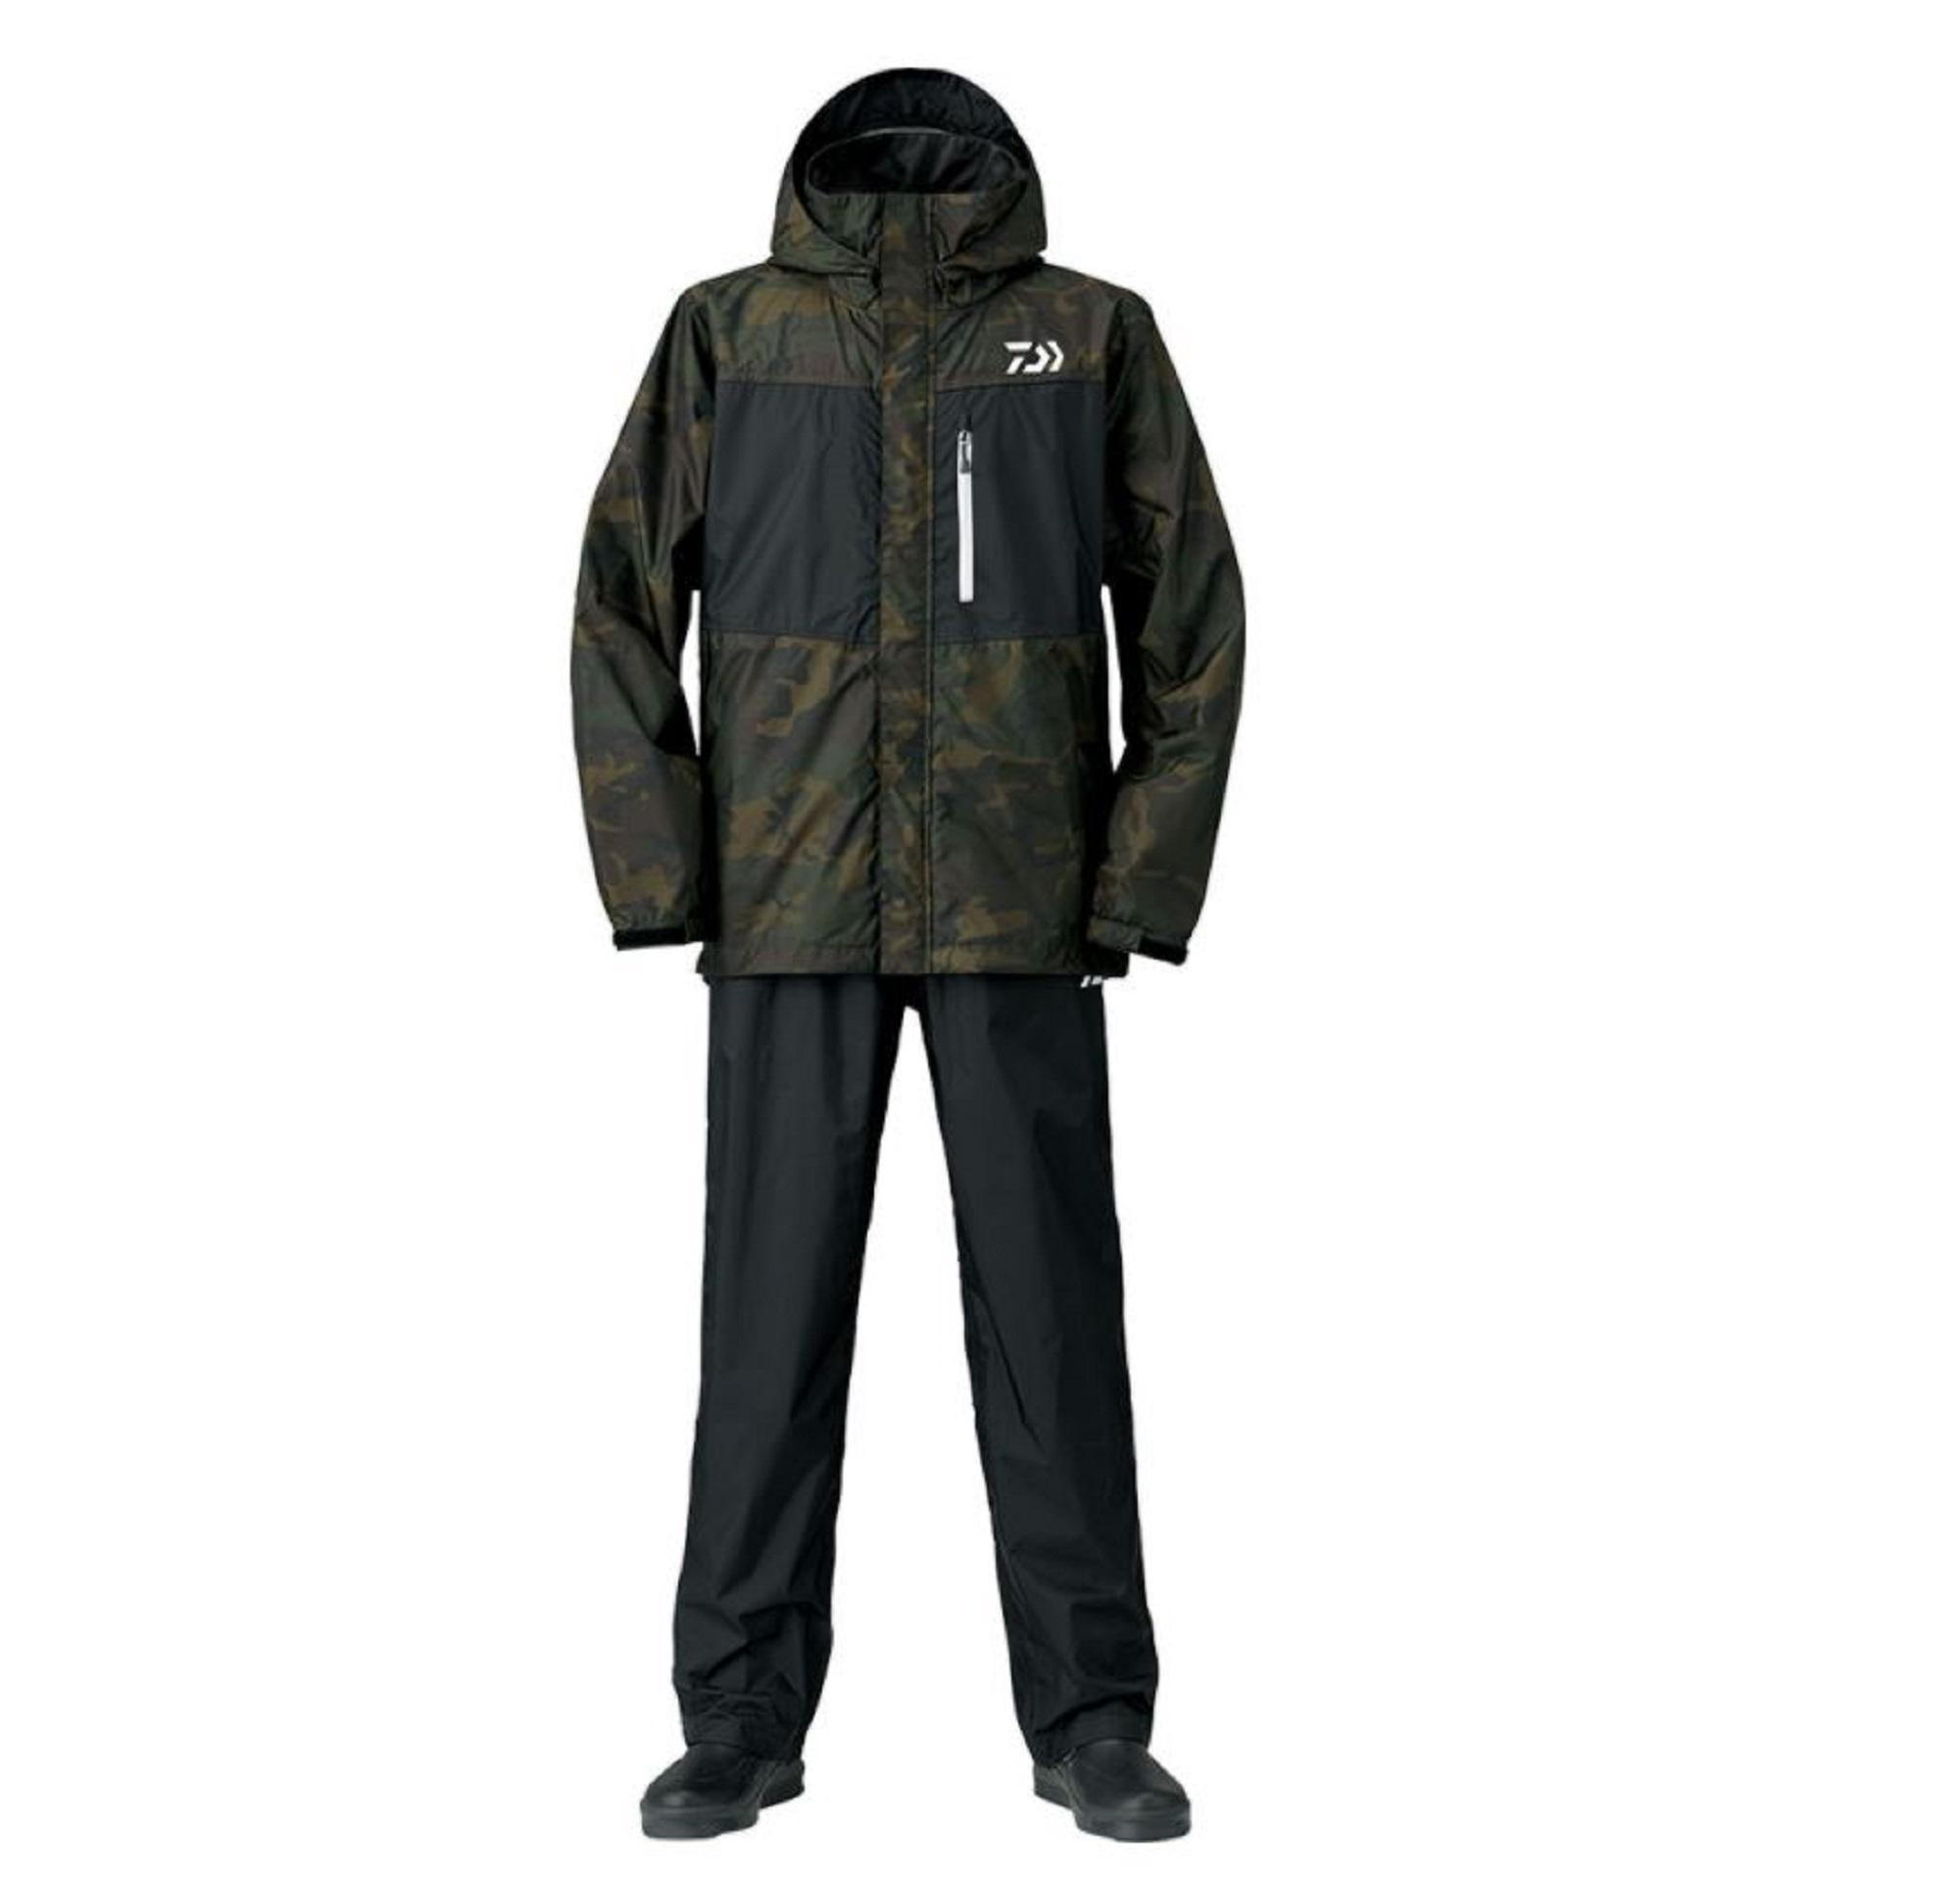 Daiwa DR-3621 Rainmax Water Repellent Jacket Size L Green Camo (6220)